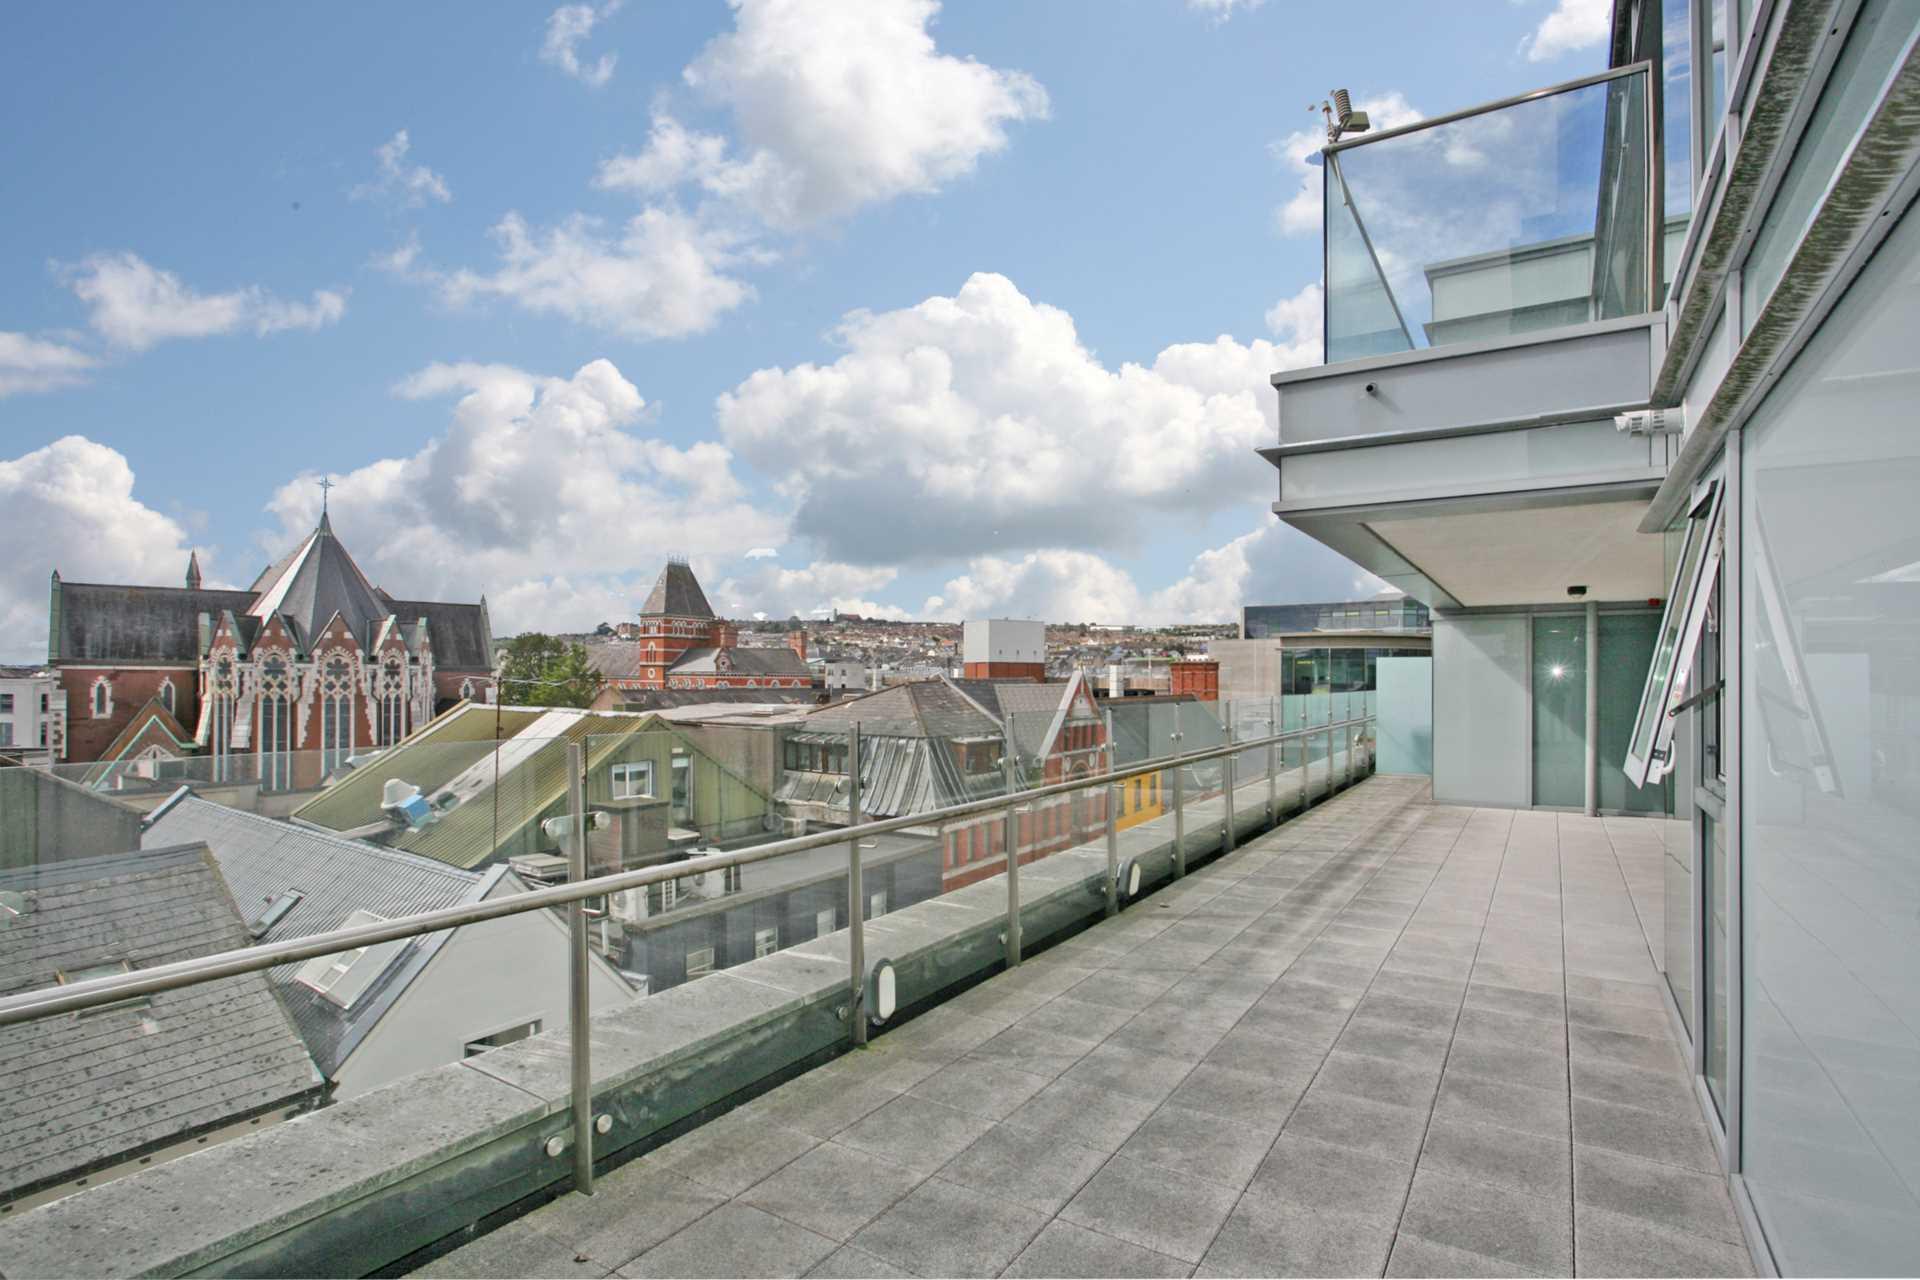 3 Opera Lane Apartment Development, 18 Academy Street, Cork City Centre, Cork City, Co. Cork